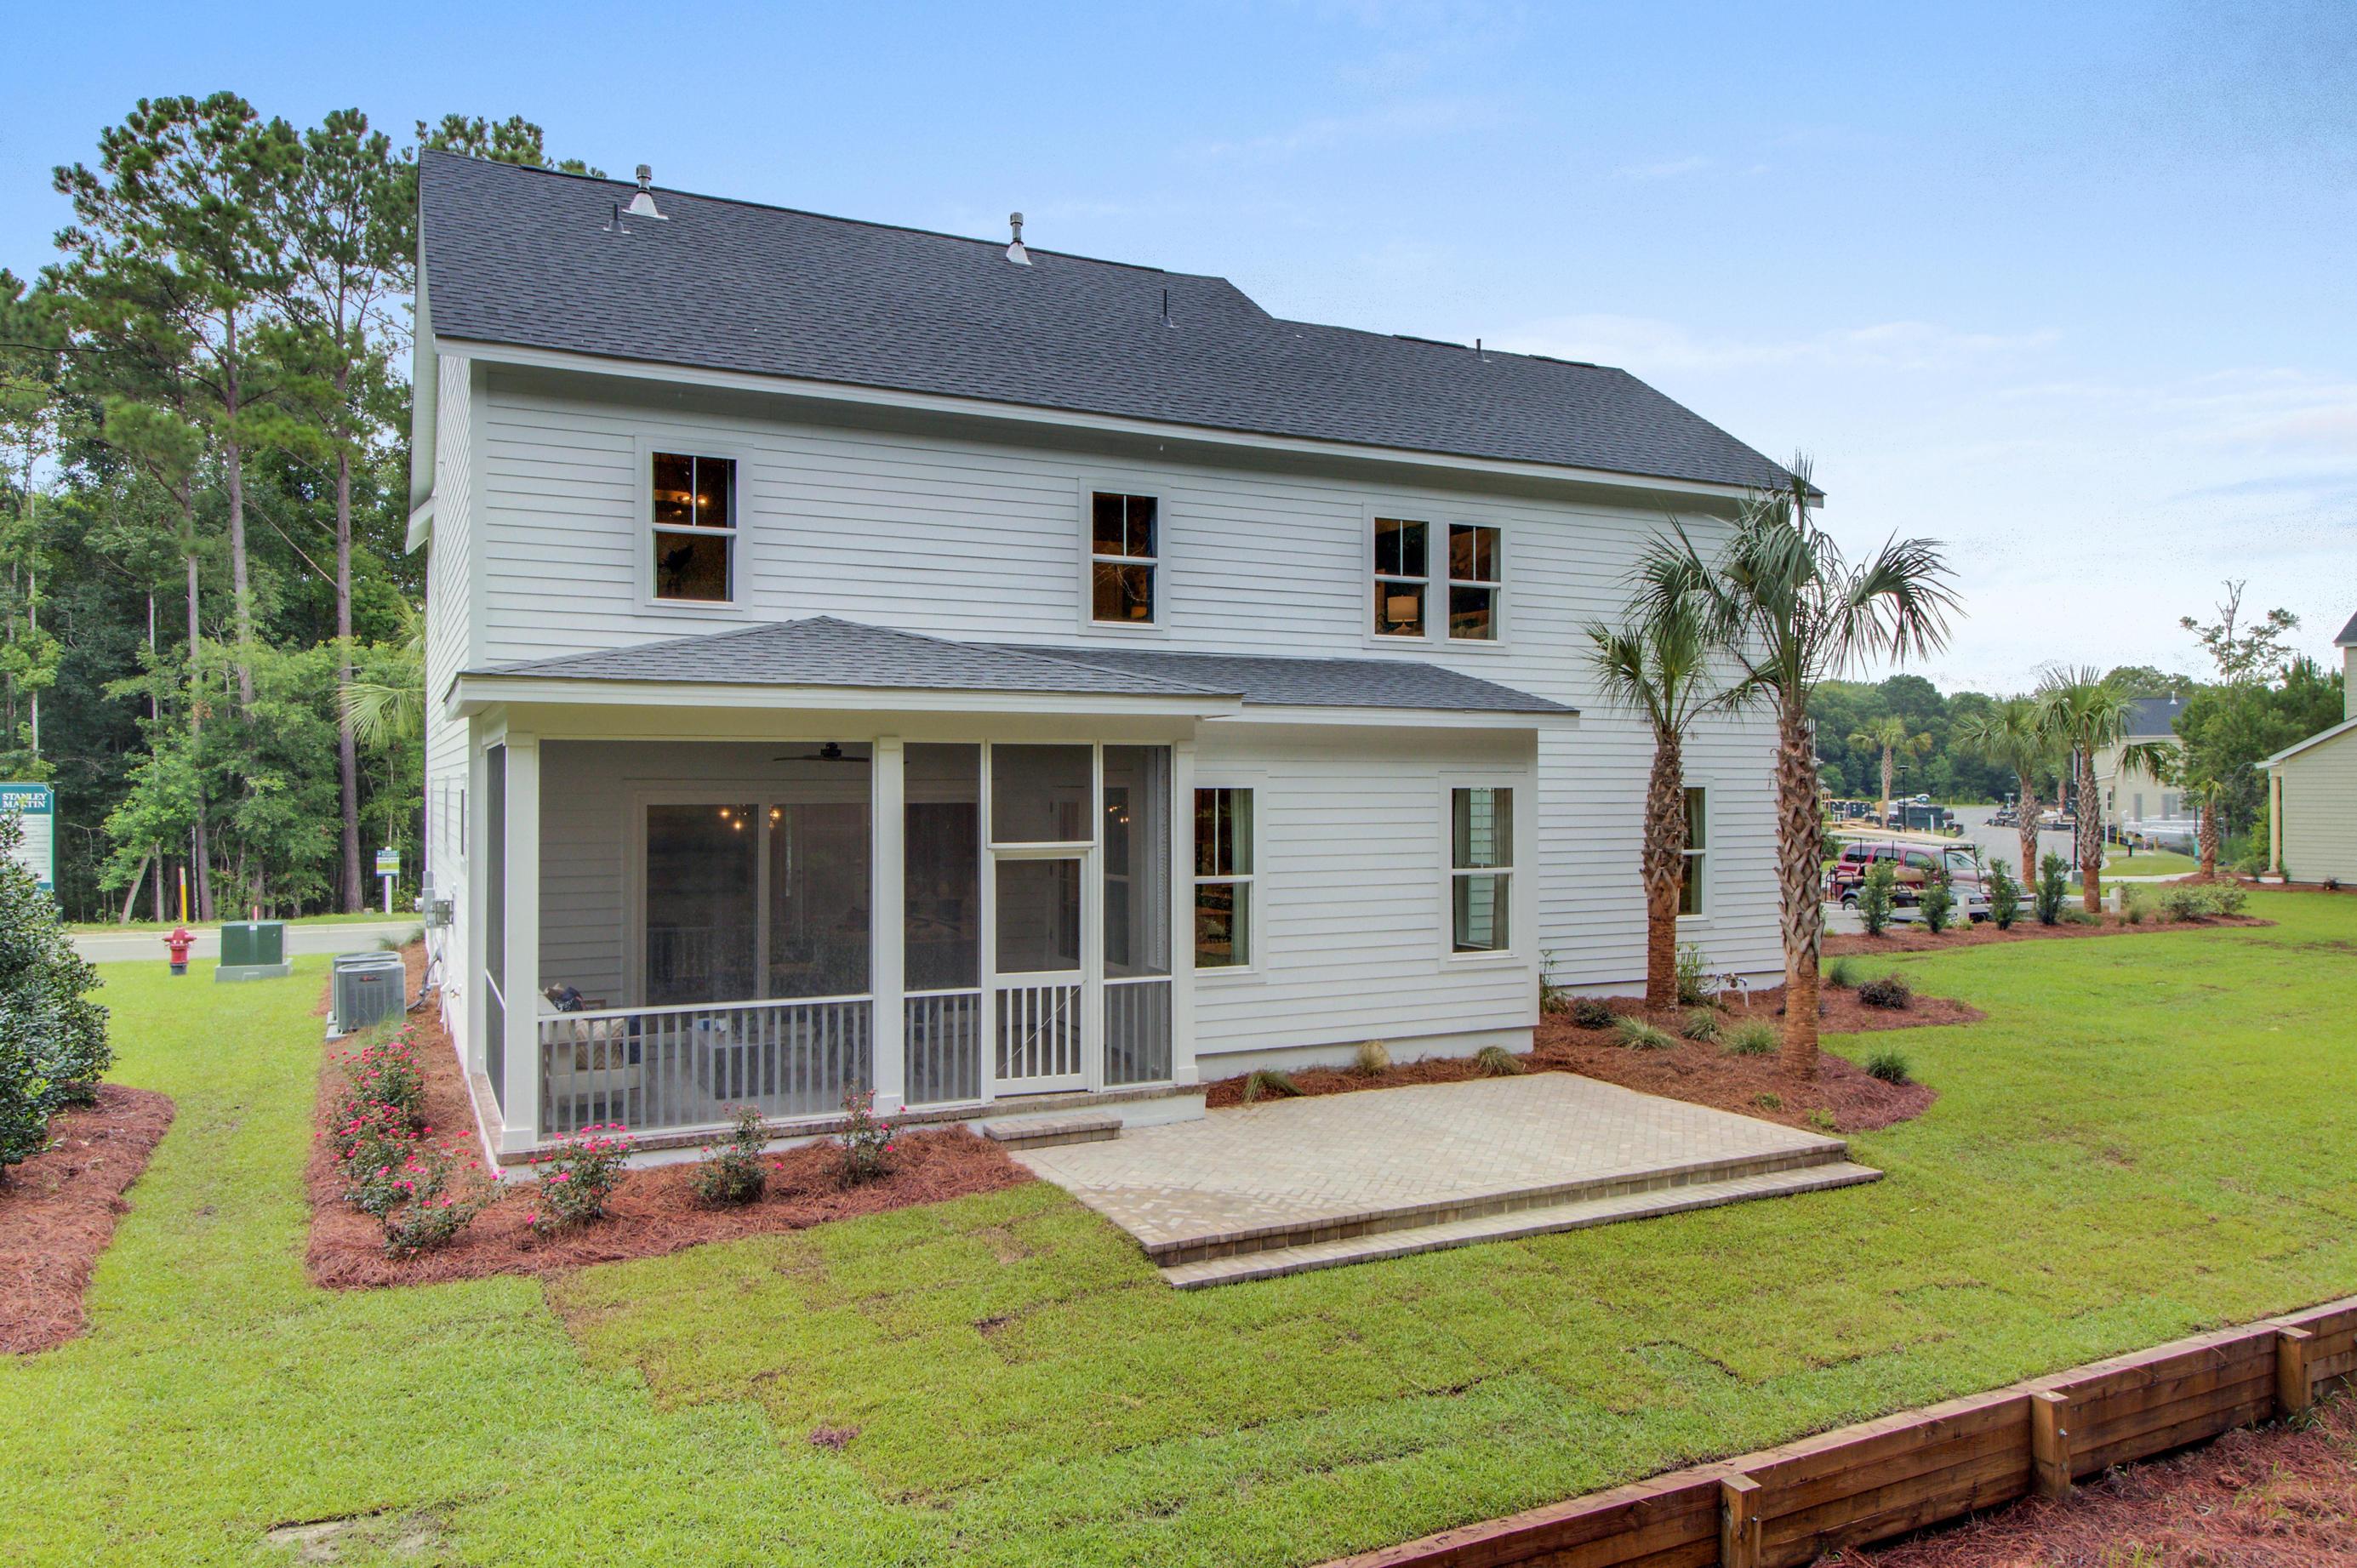 Fulton Park Homes For Sale - 1201 Max, Mount Pleasant, SC - 2